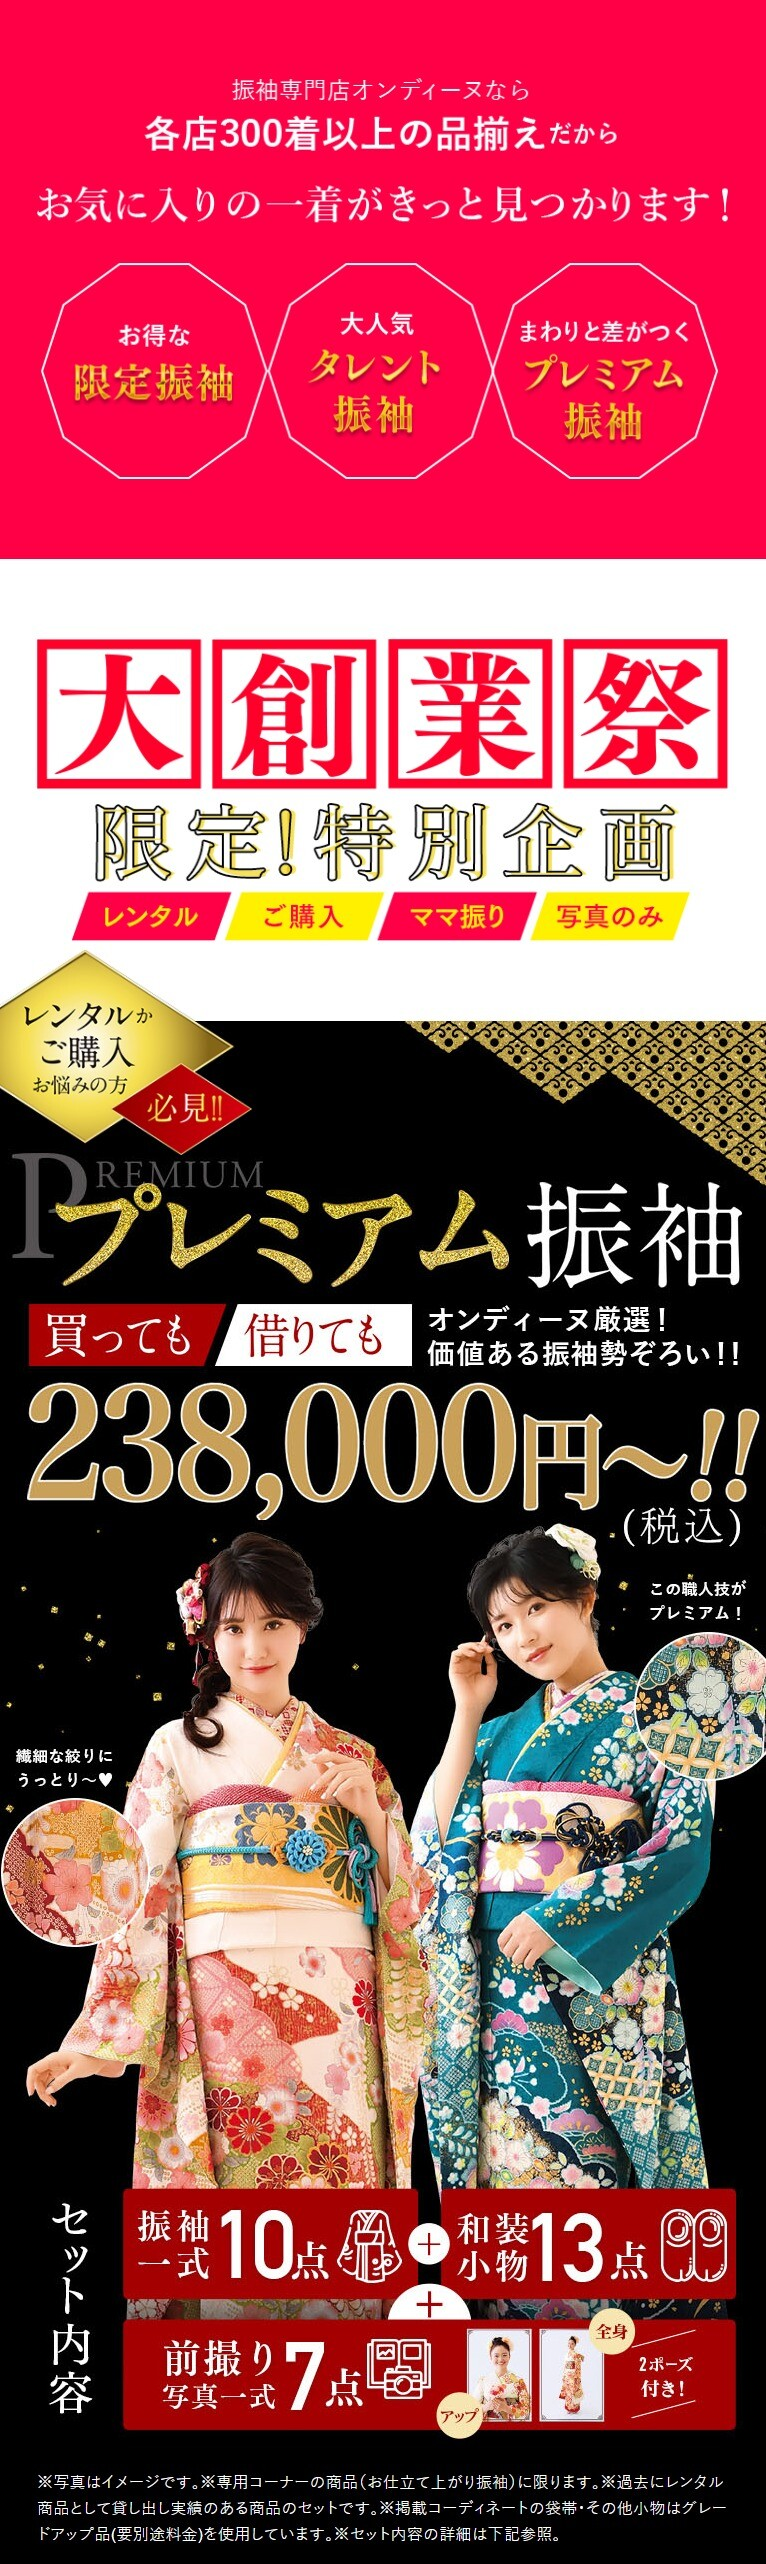 FireShot Capture 6780 - 振袖大創業祭 成人式の振袖レンタル・販売オンディーヌ - www.ondine.jp